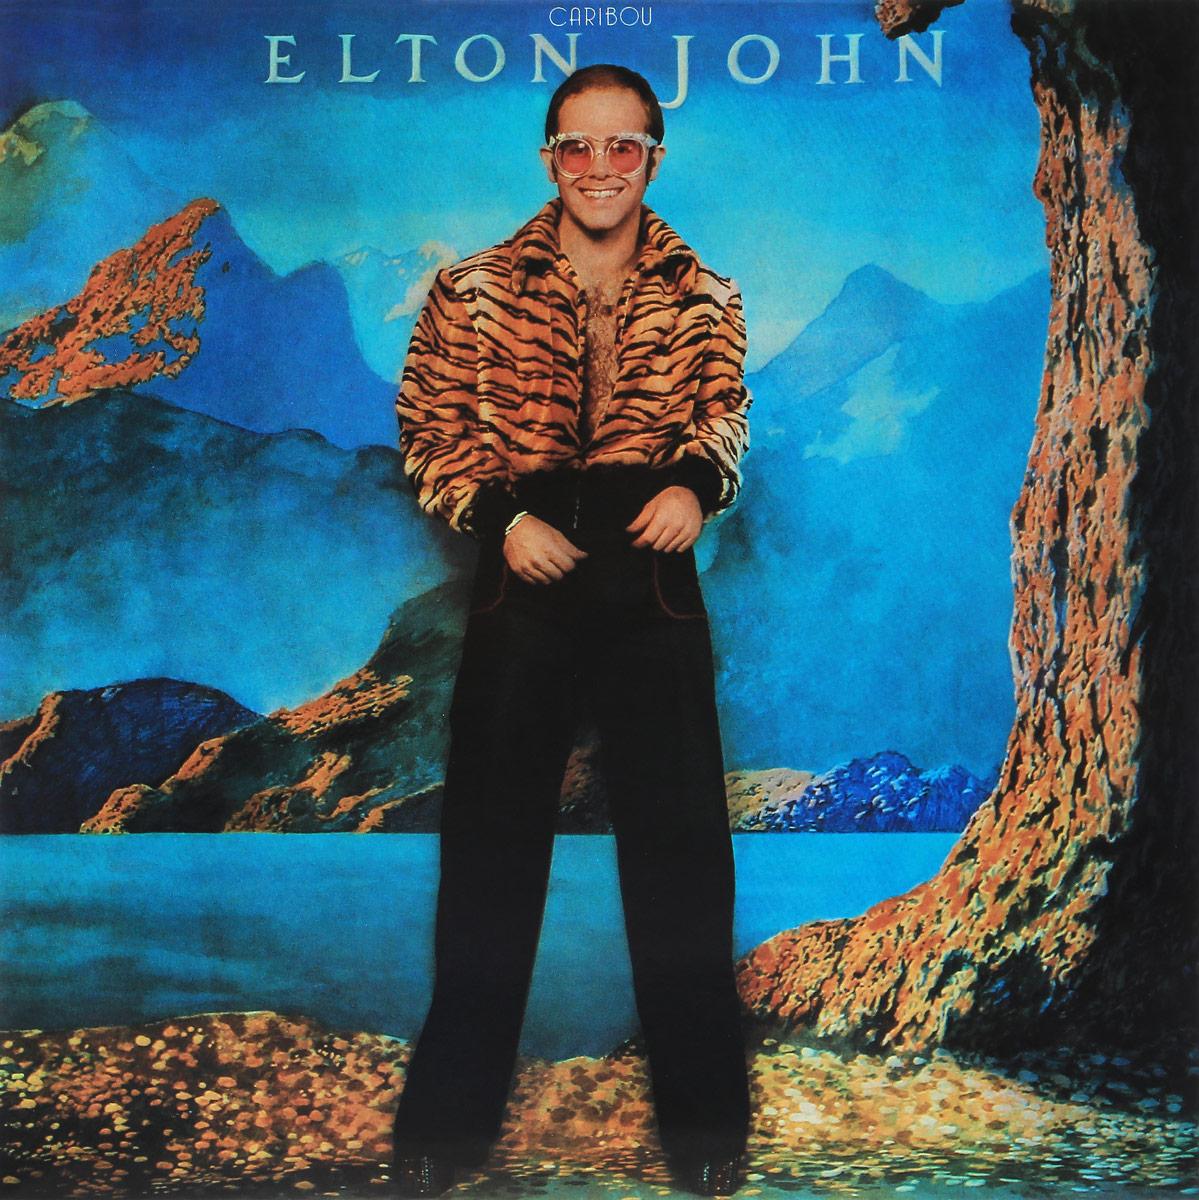 Элтон Джон Elton John. Caribou (LP) элтон джон elton john tumbleweed connection